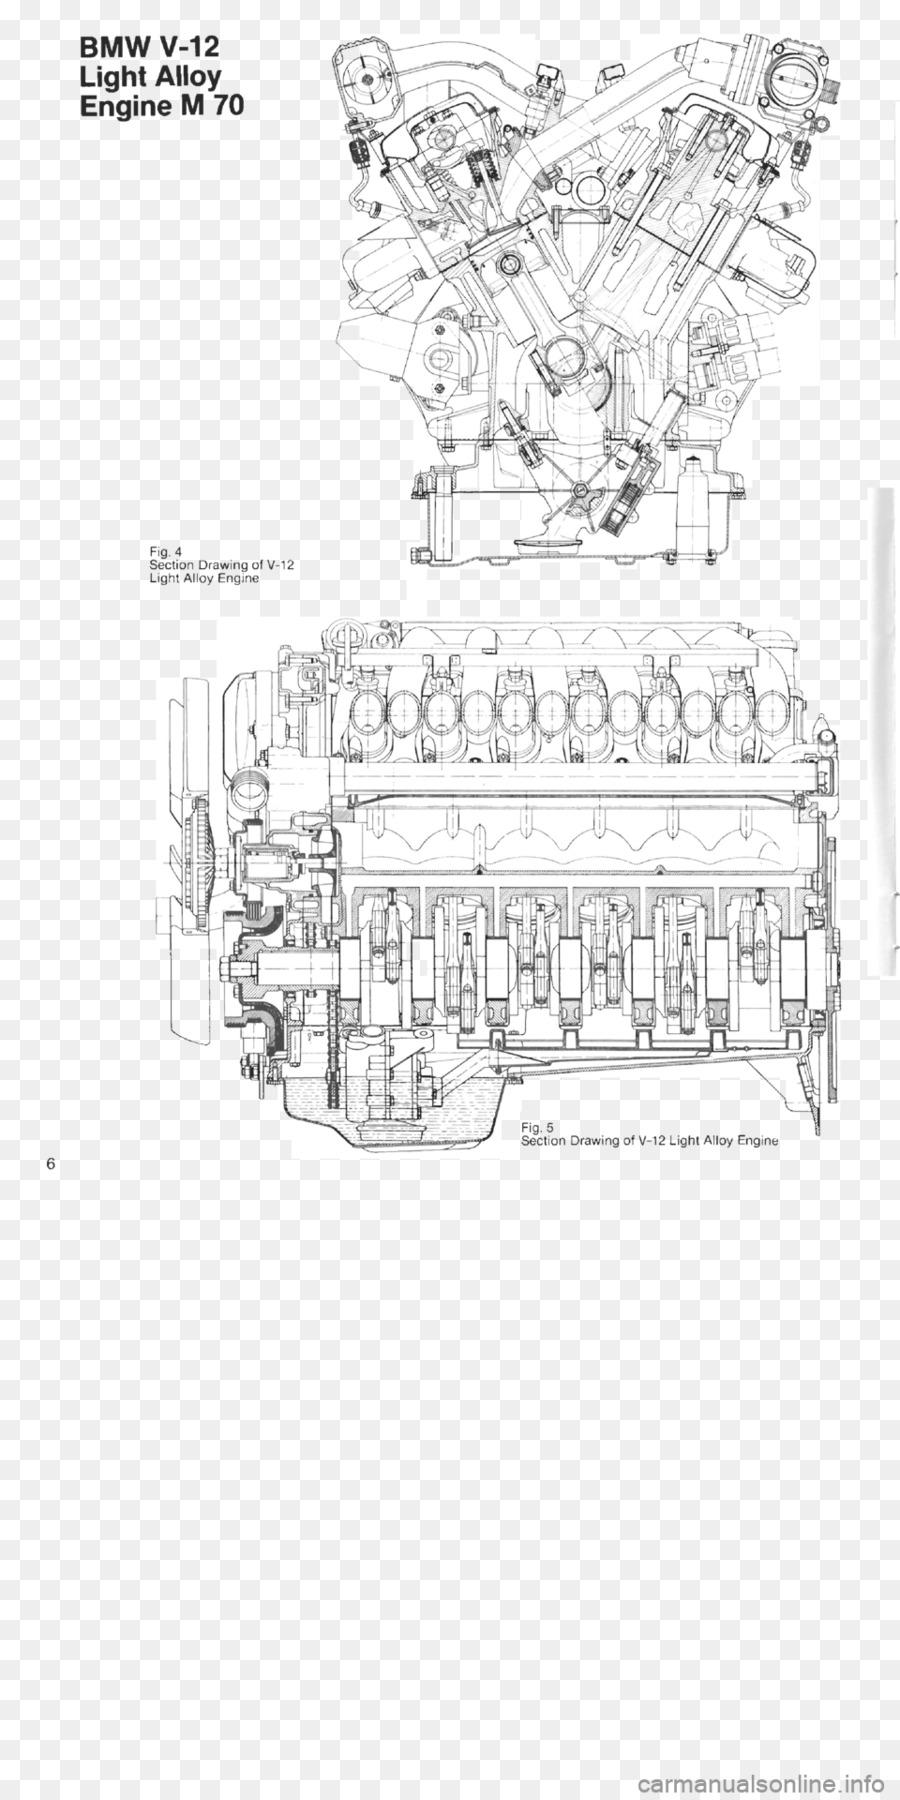 bmw v12 lmr bmw 3 series bmw m20 bmw 7 series g11 bmw 7 series rh kisspng com Engine Cutaway Diagram V4 Engine Diagram